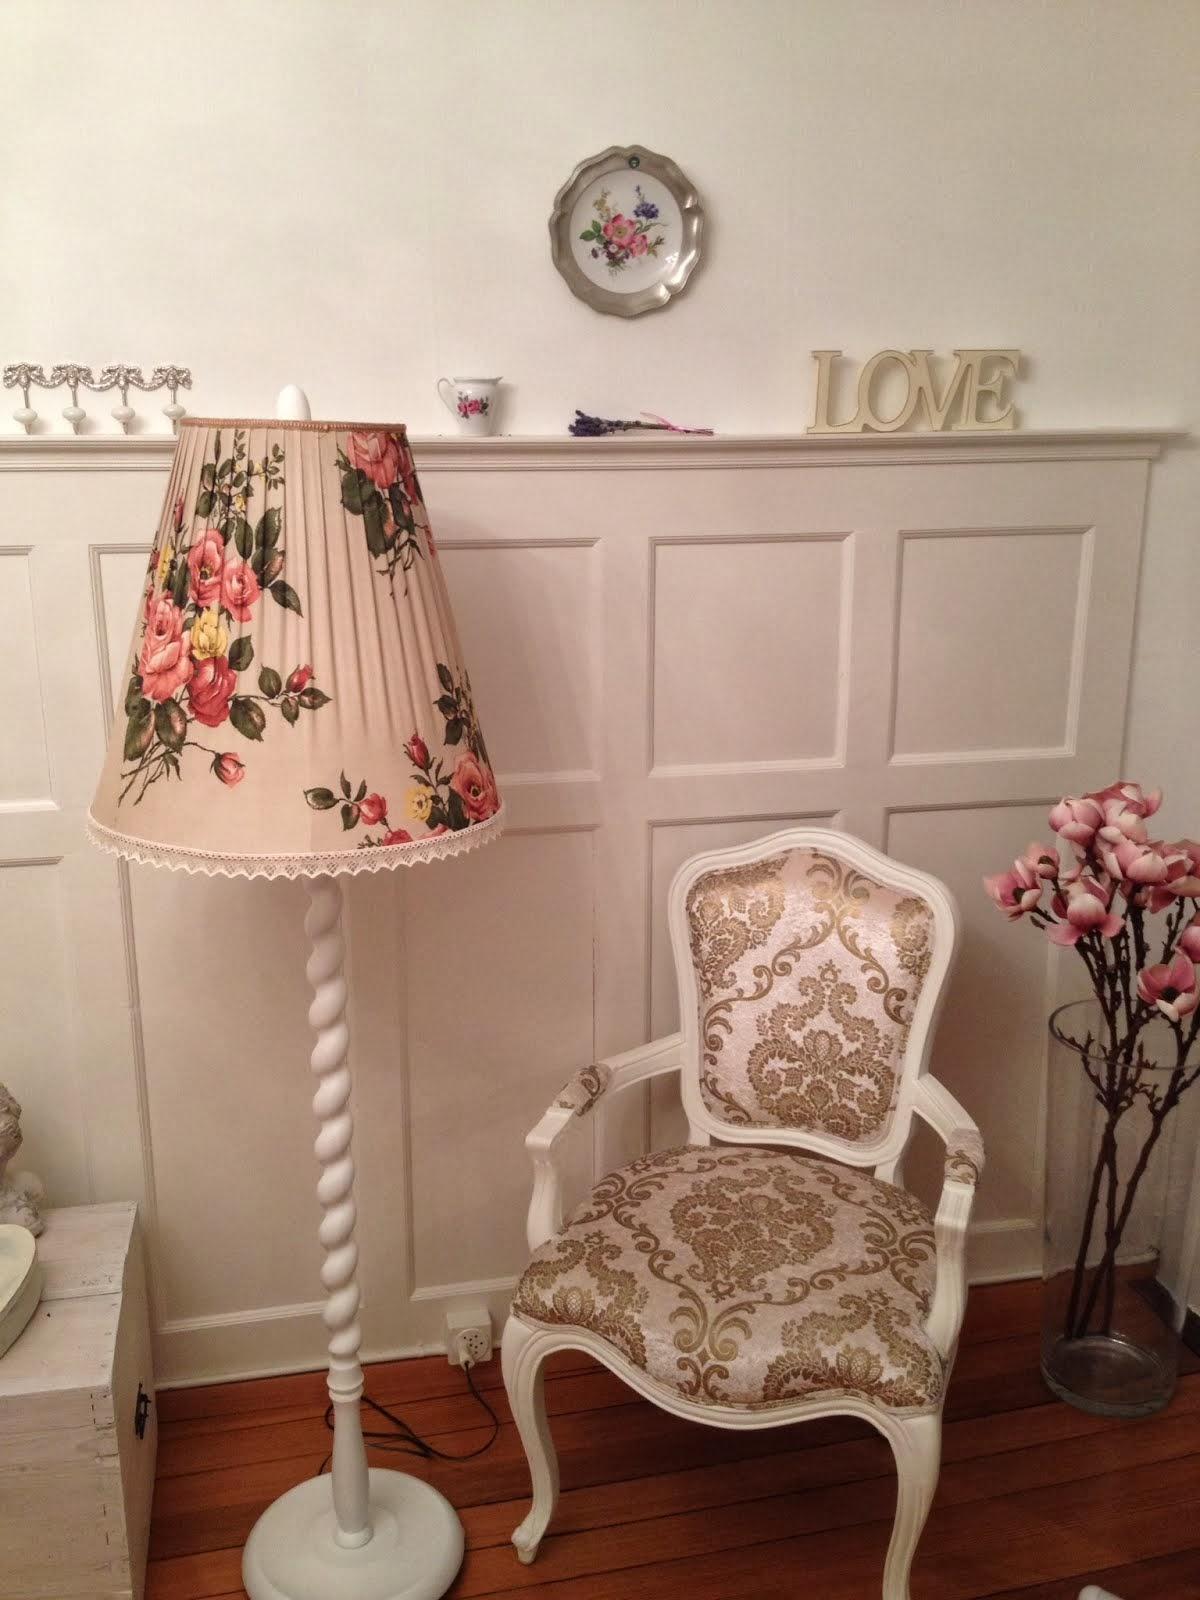 faby 39 s shabby chic vorher nachher. Black Bedroom Furniture Sets. Home Design Ideas